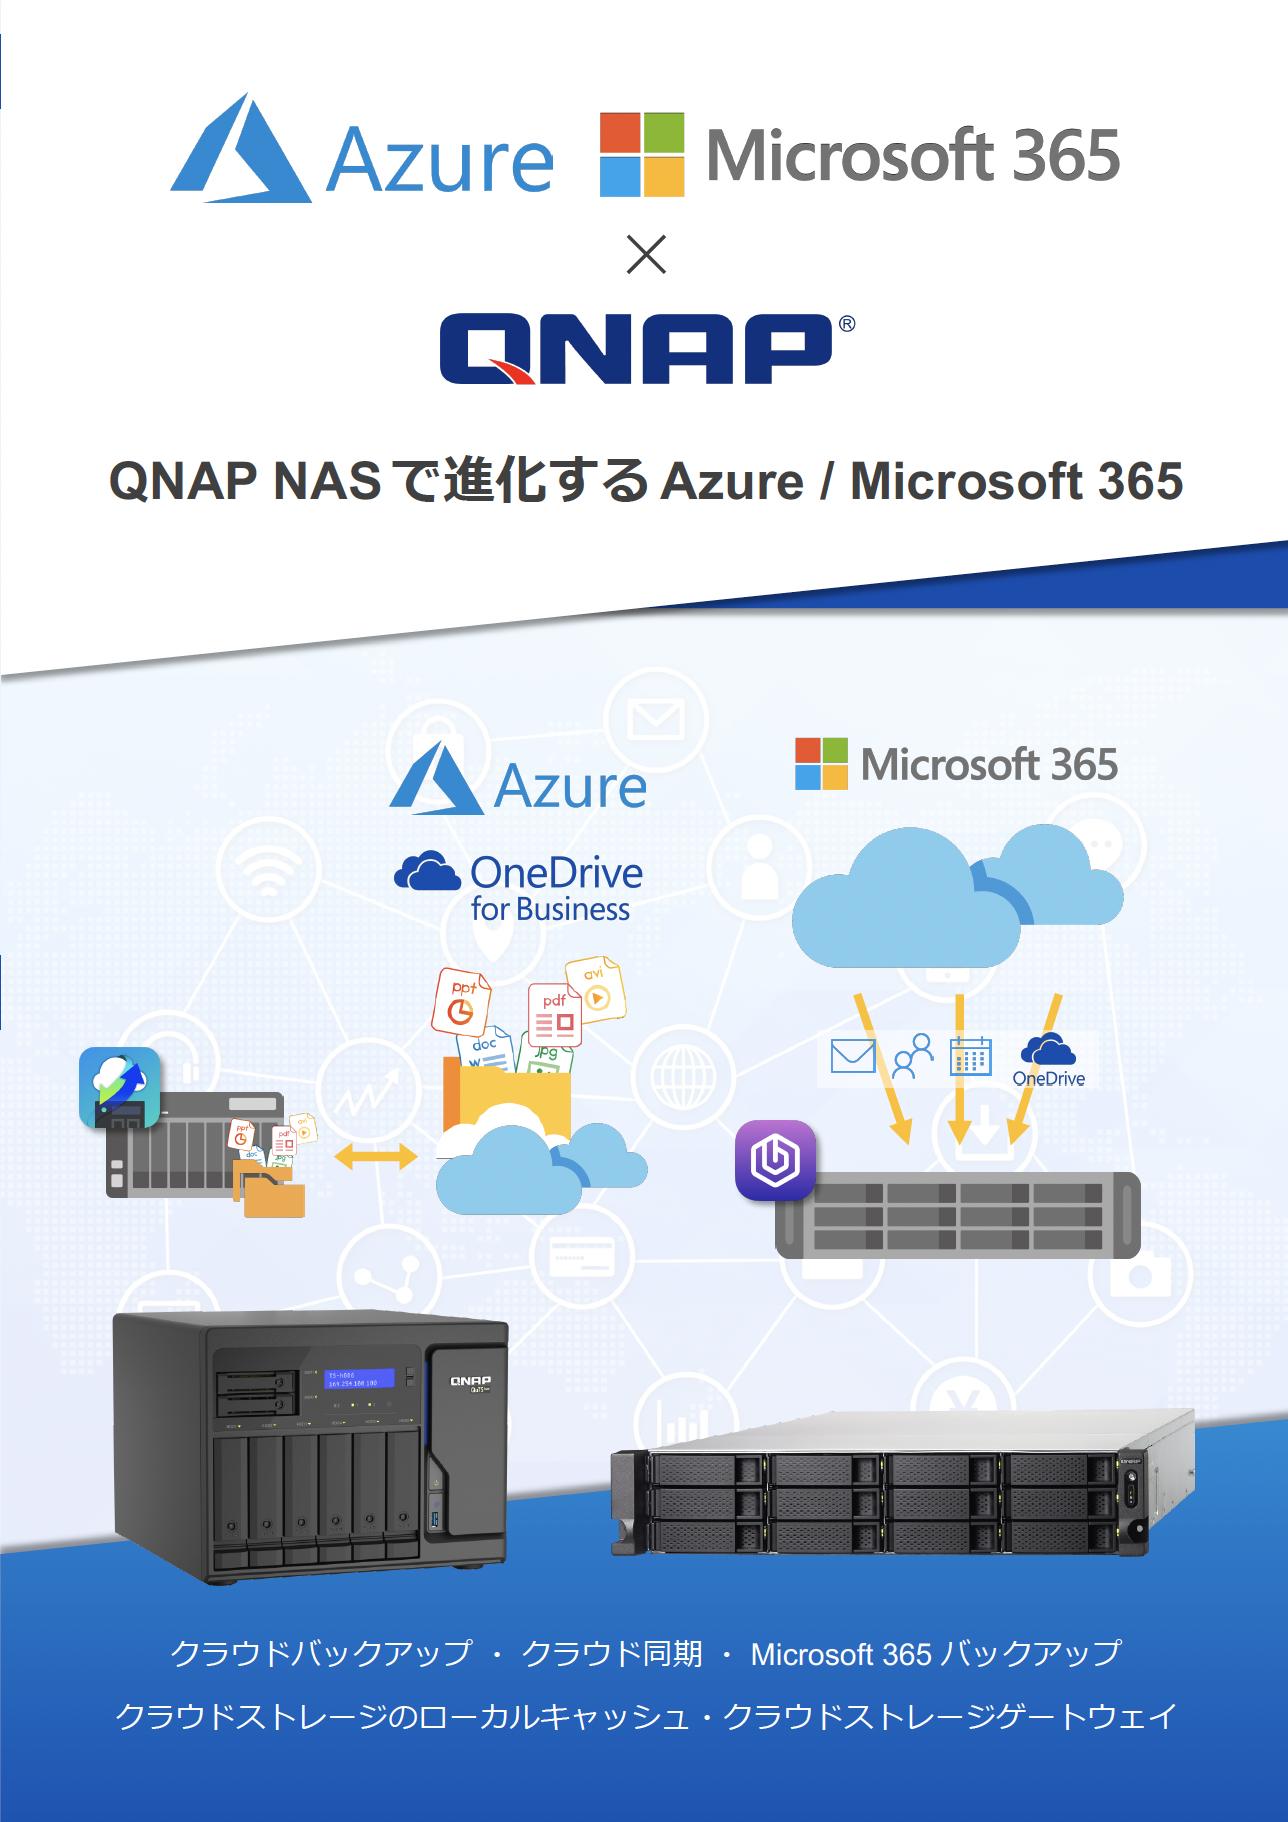 QNAP NASで進化するAzure / Microsoft 365